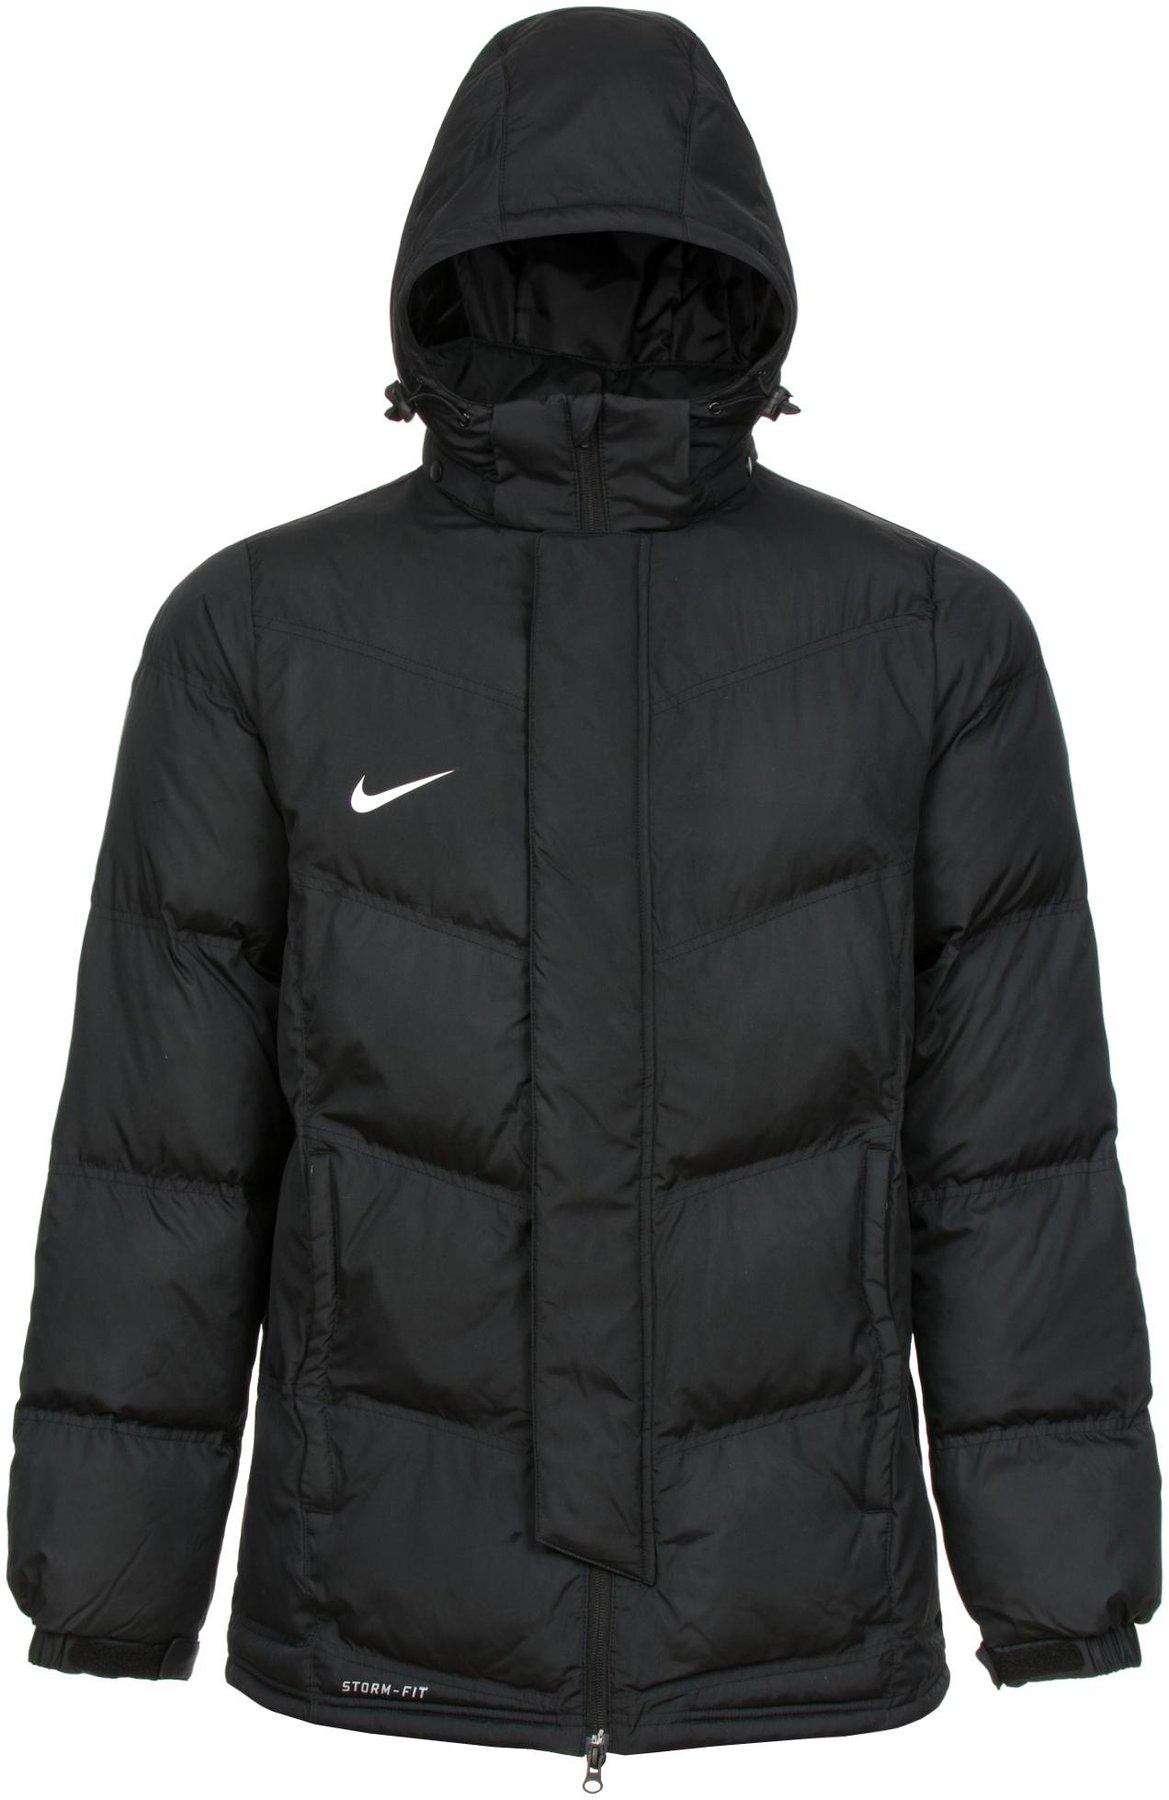 official images various styles vast selection Nike Winterjacke Kinder